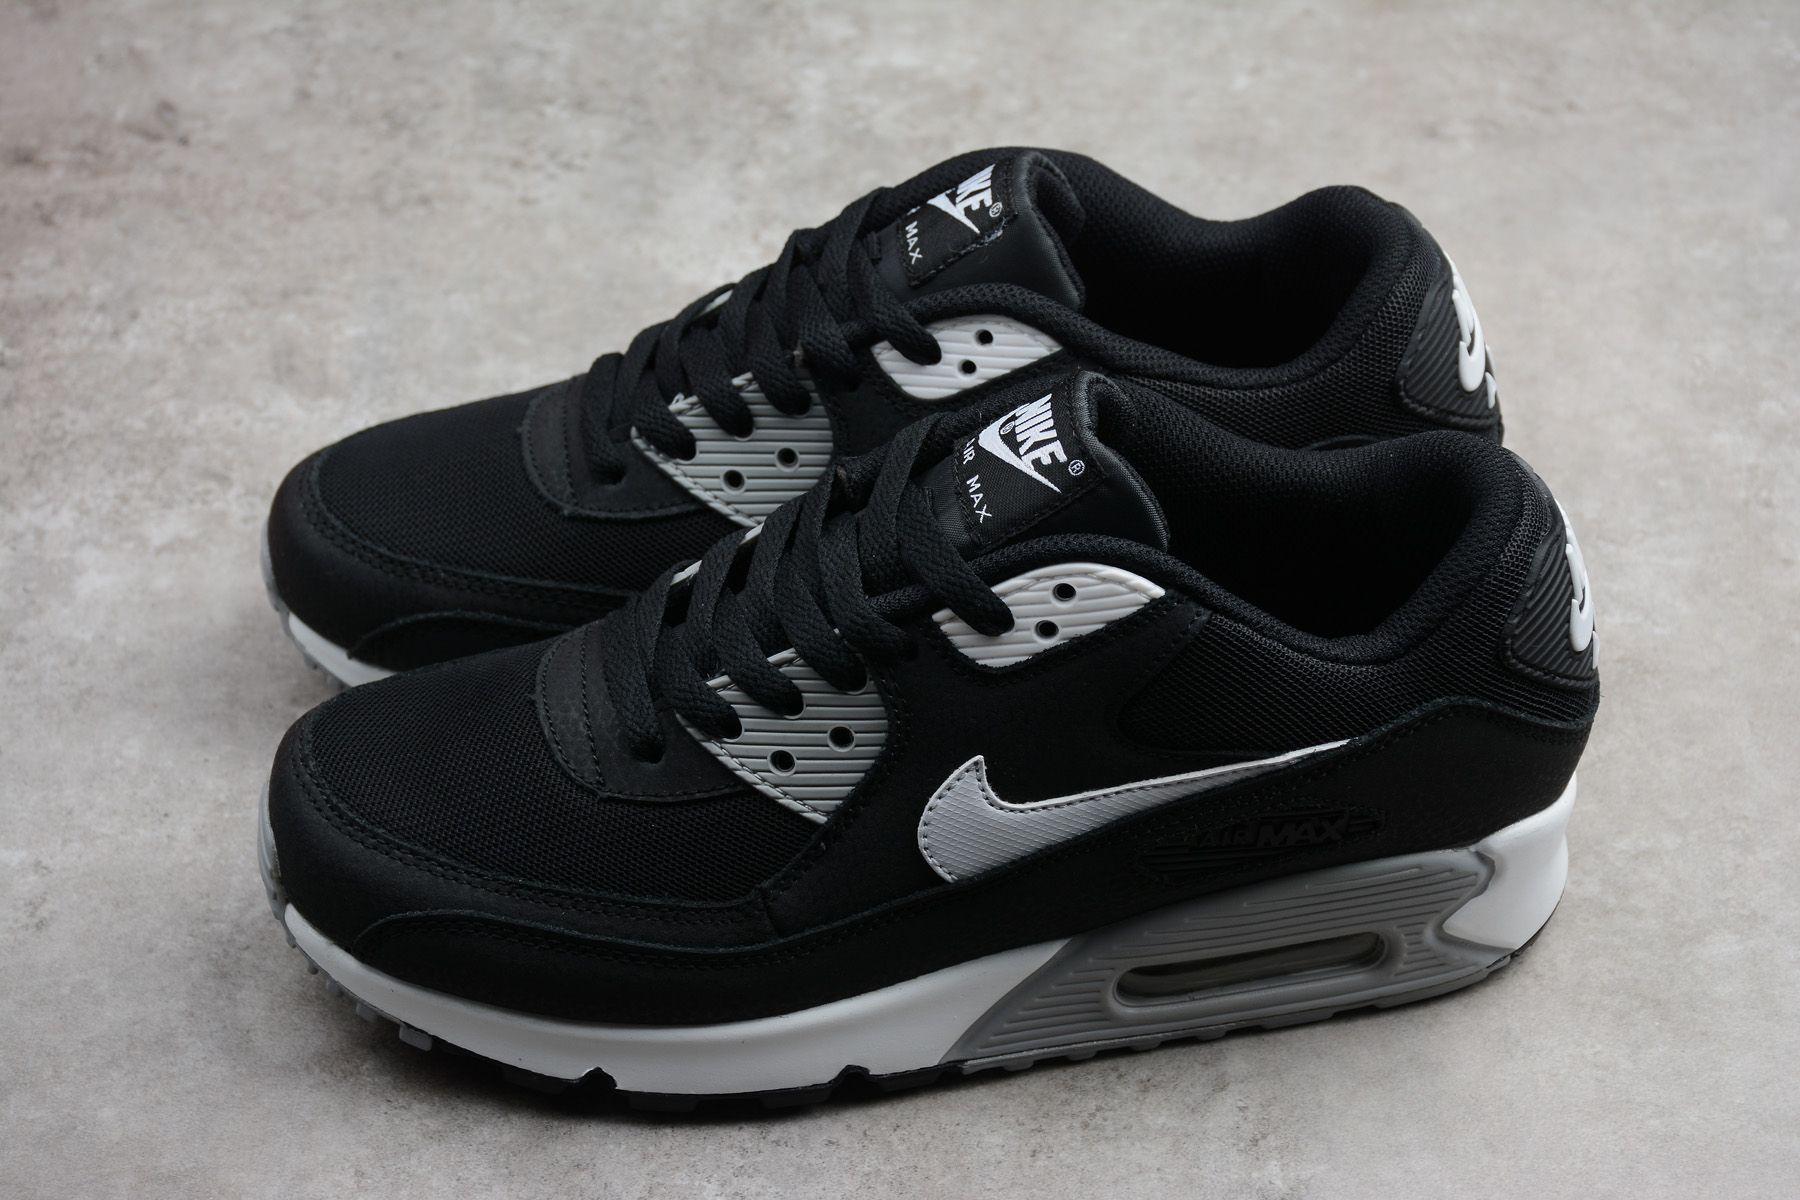 acd303ad7b6 Nike Air Max 90 Essential Black White-Dark Grey-Wolf Grey to buy online